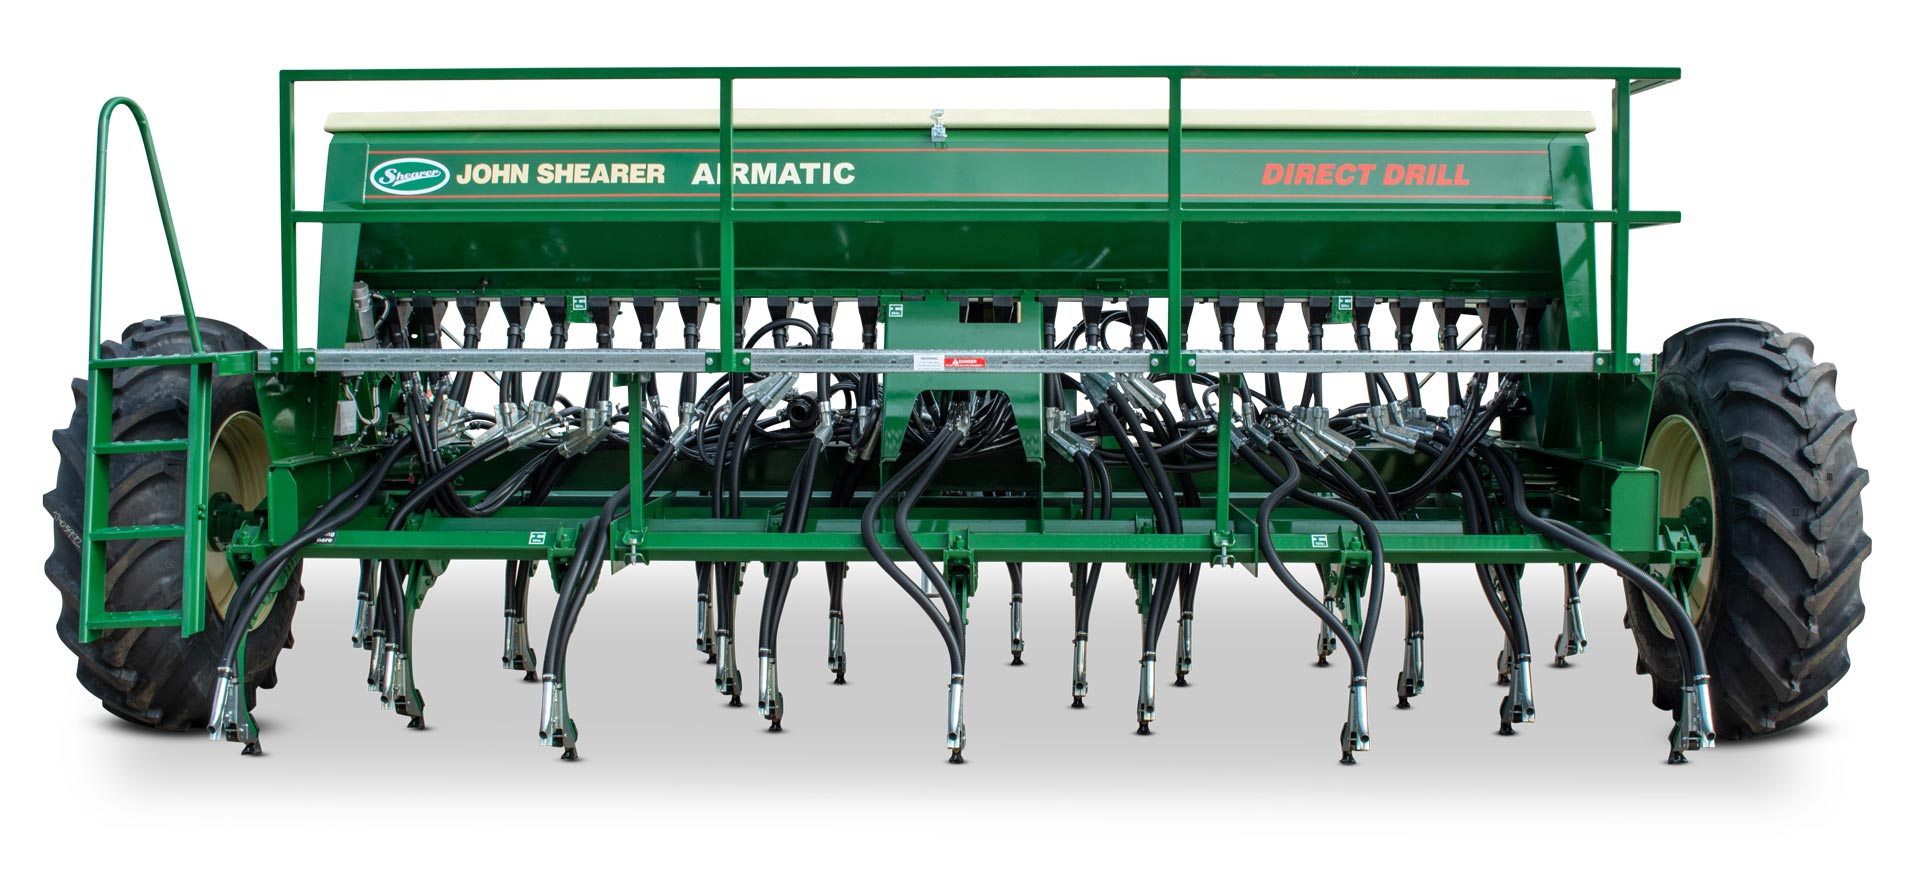 Airmatic Direct Drill